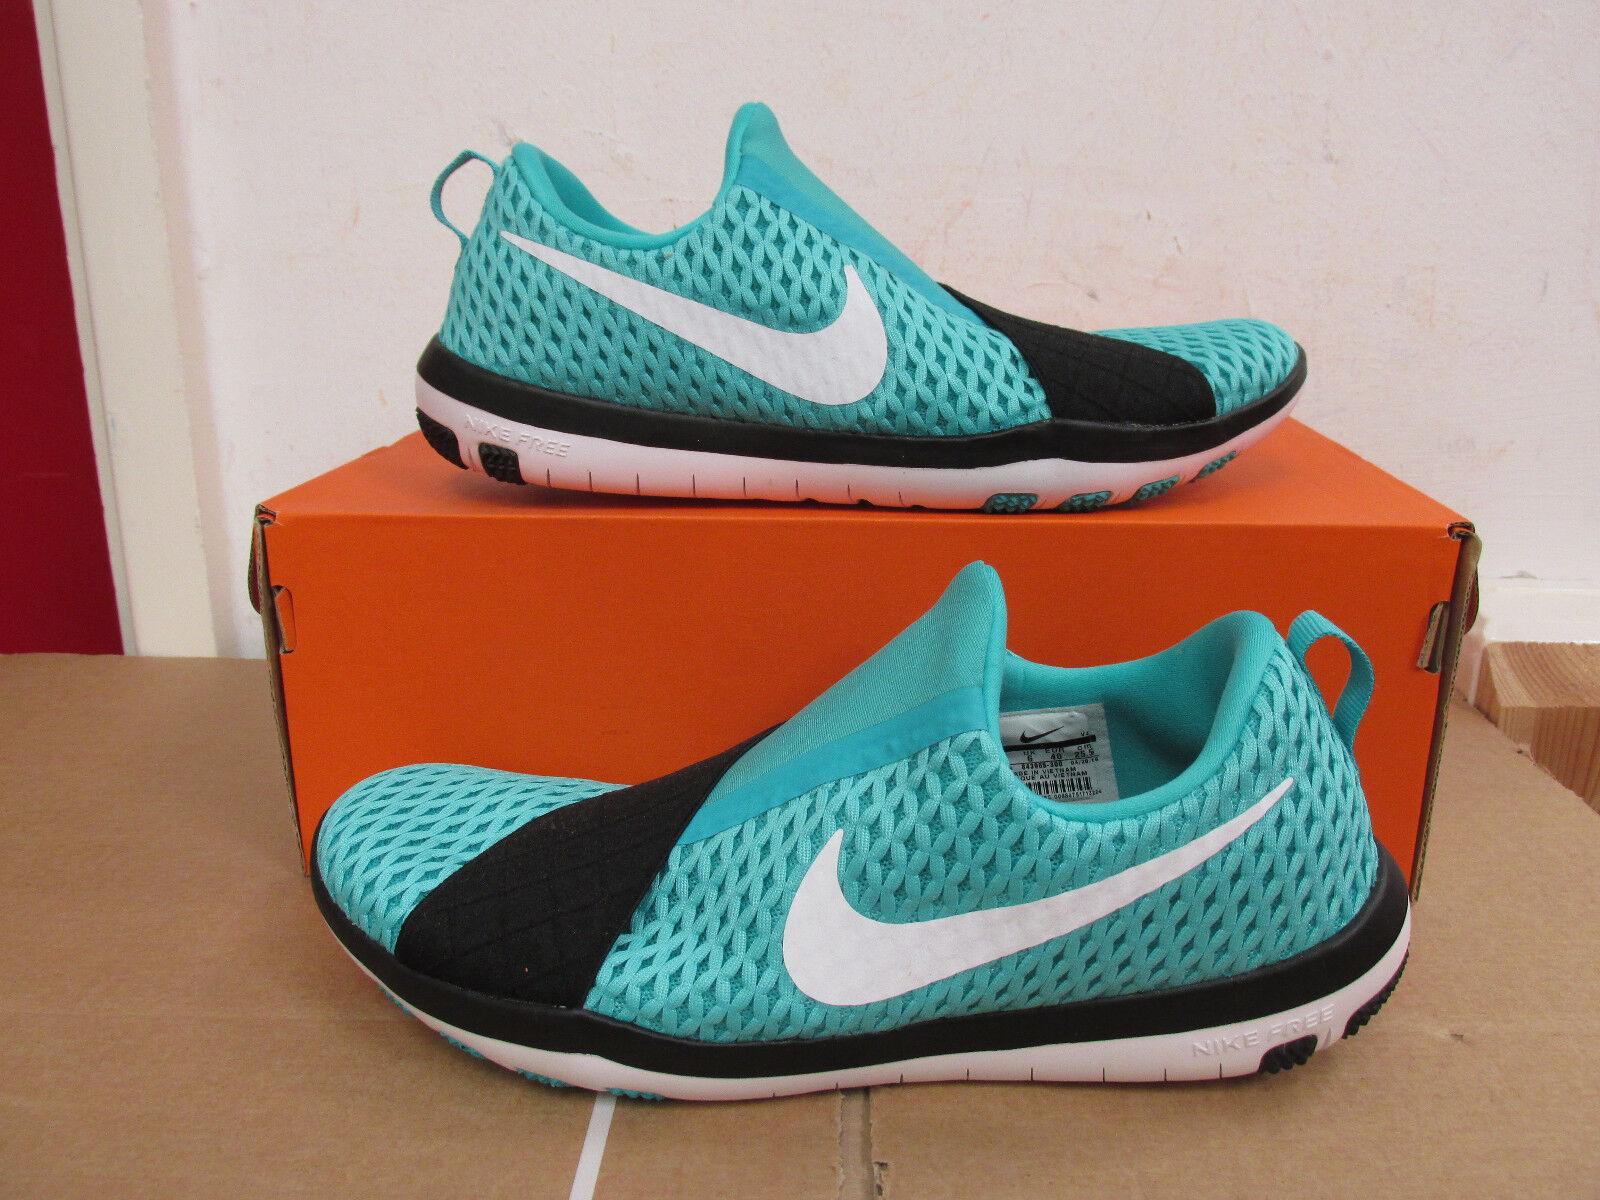 Nike da Donna Gratis Connect Scarpe Shoess Corsa 843966 300 Ginnastica Shoess Scarpe Svendita 248acb